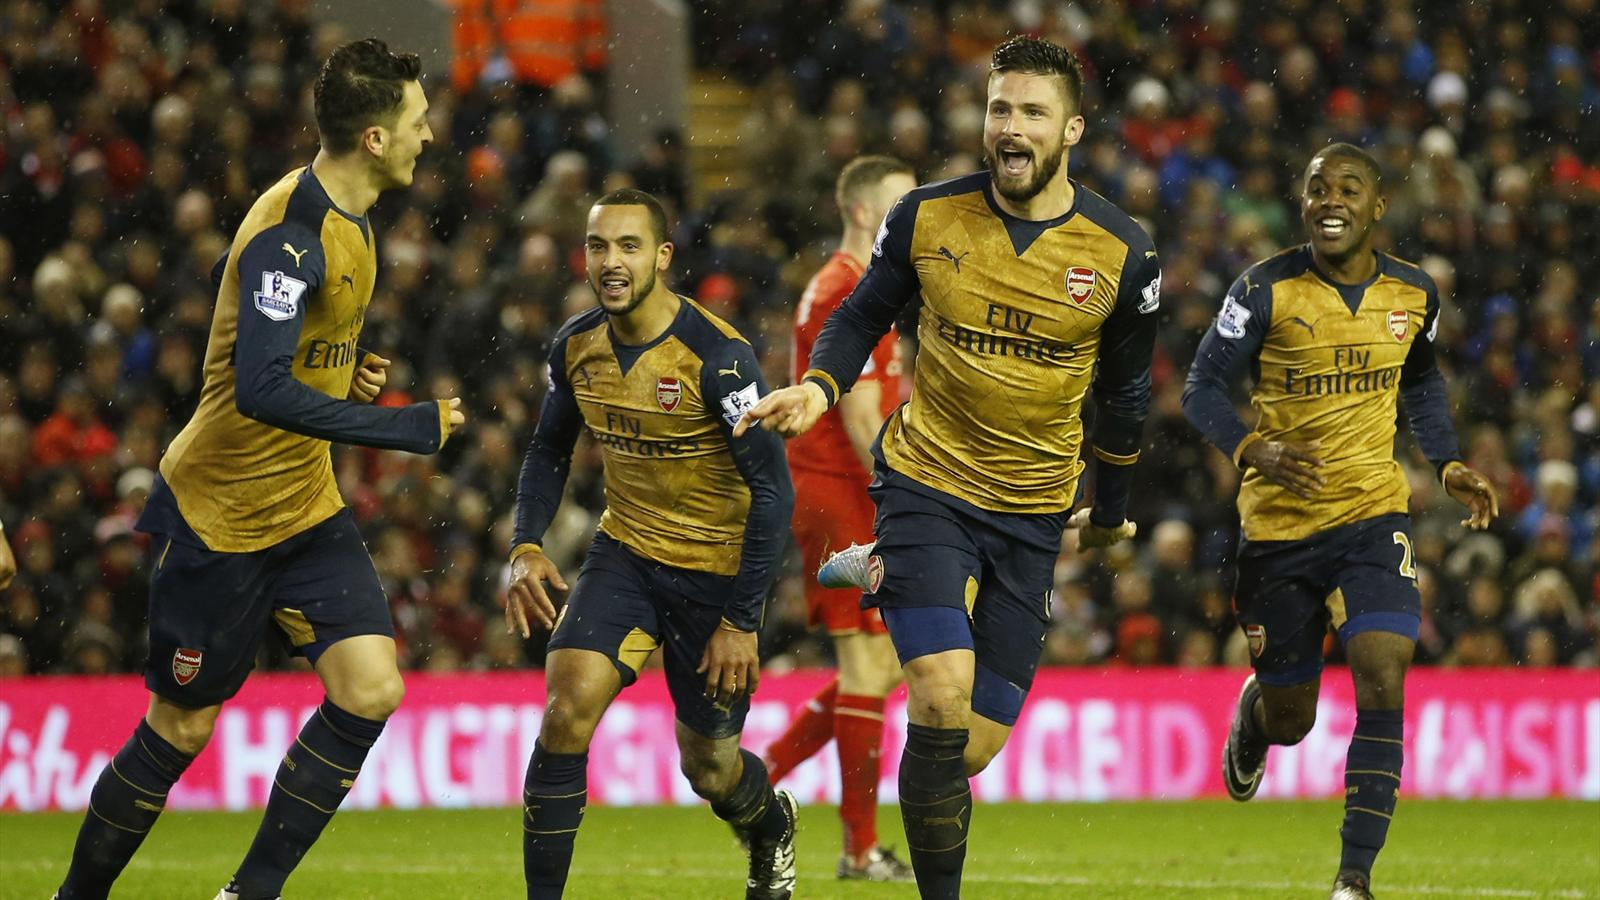 Olivier Giroud celebrates scoring the third goal for Arsenal against Liverpool